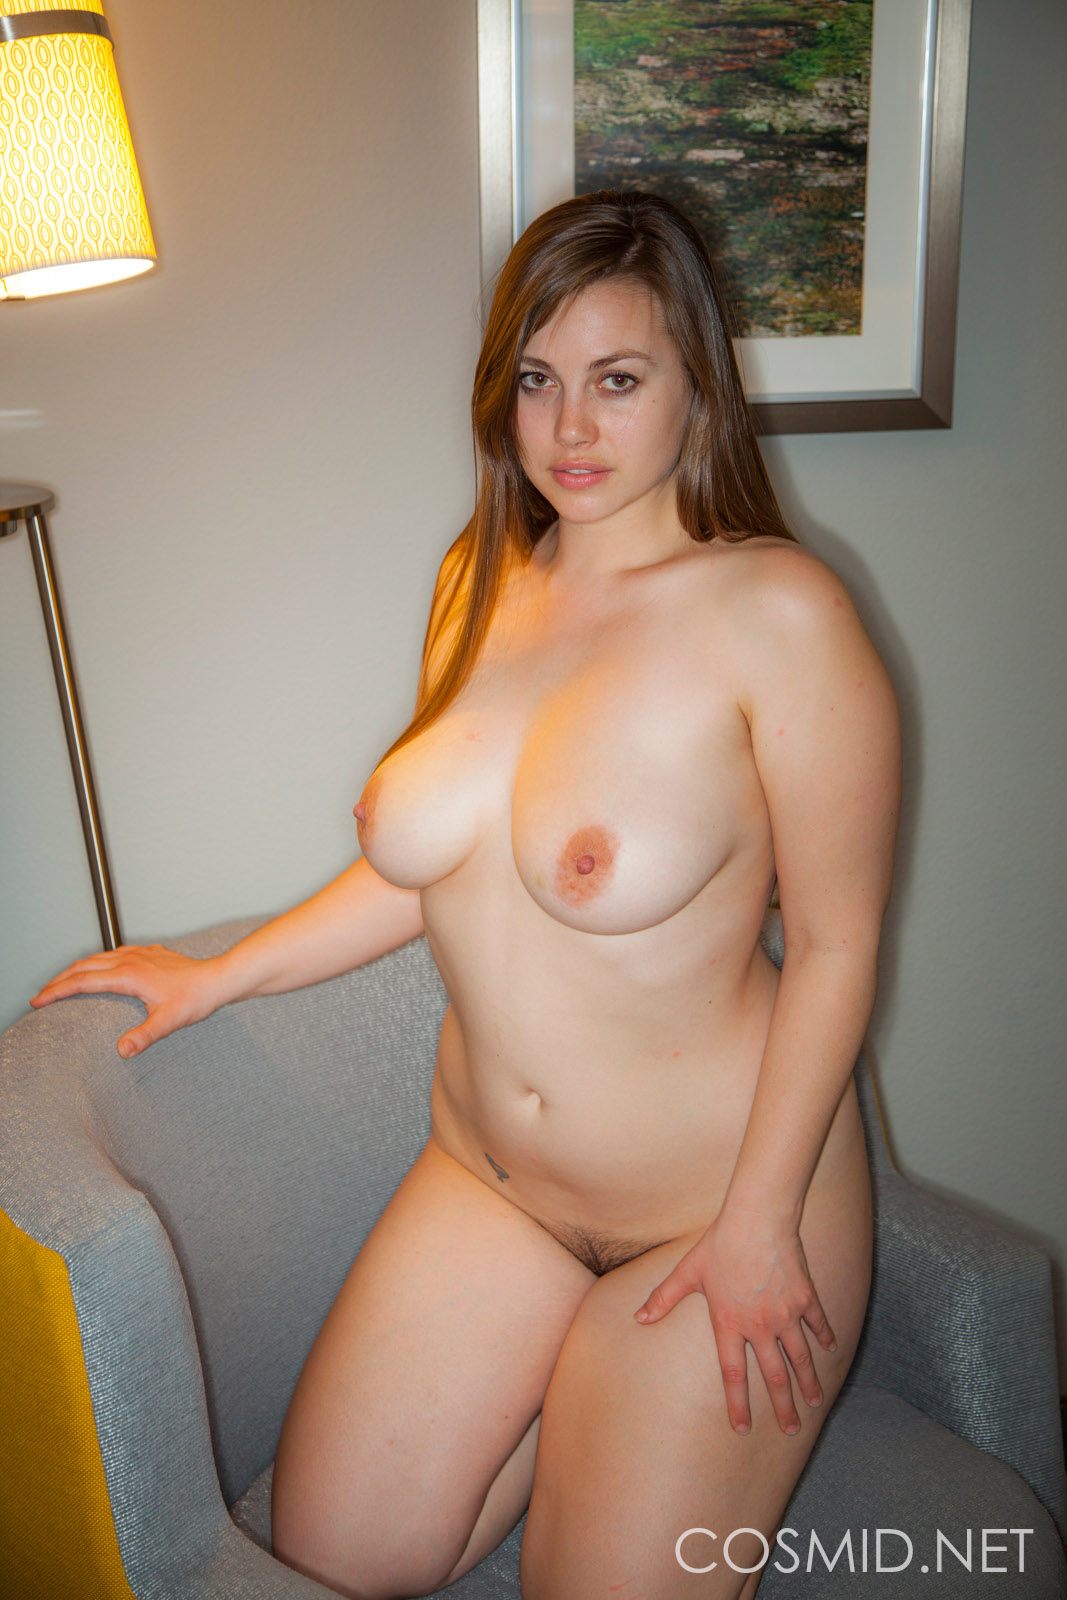 rachel mcadams showing her pussy